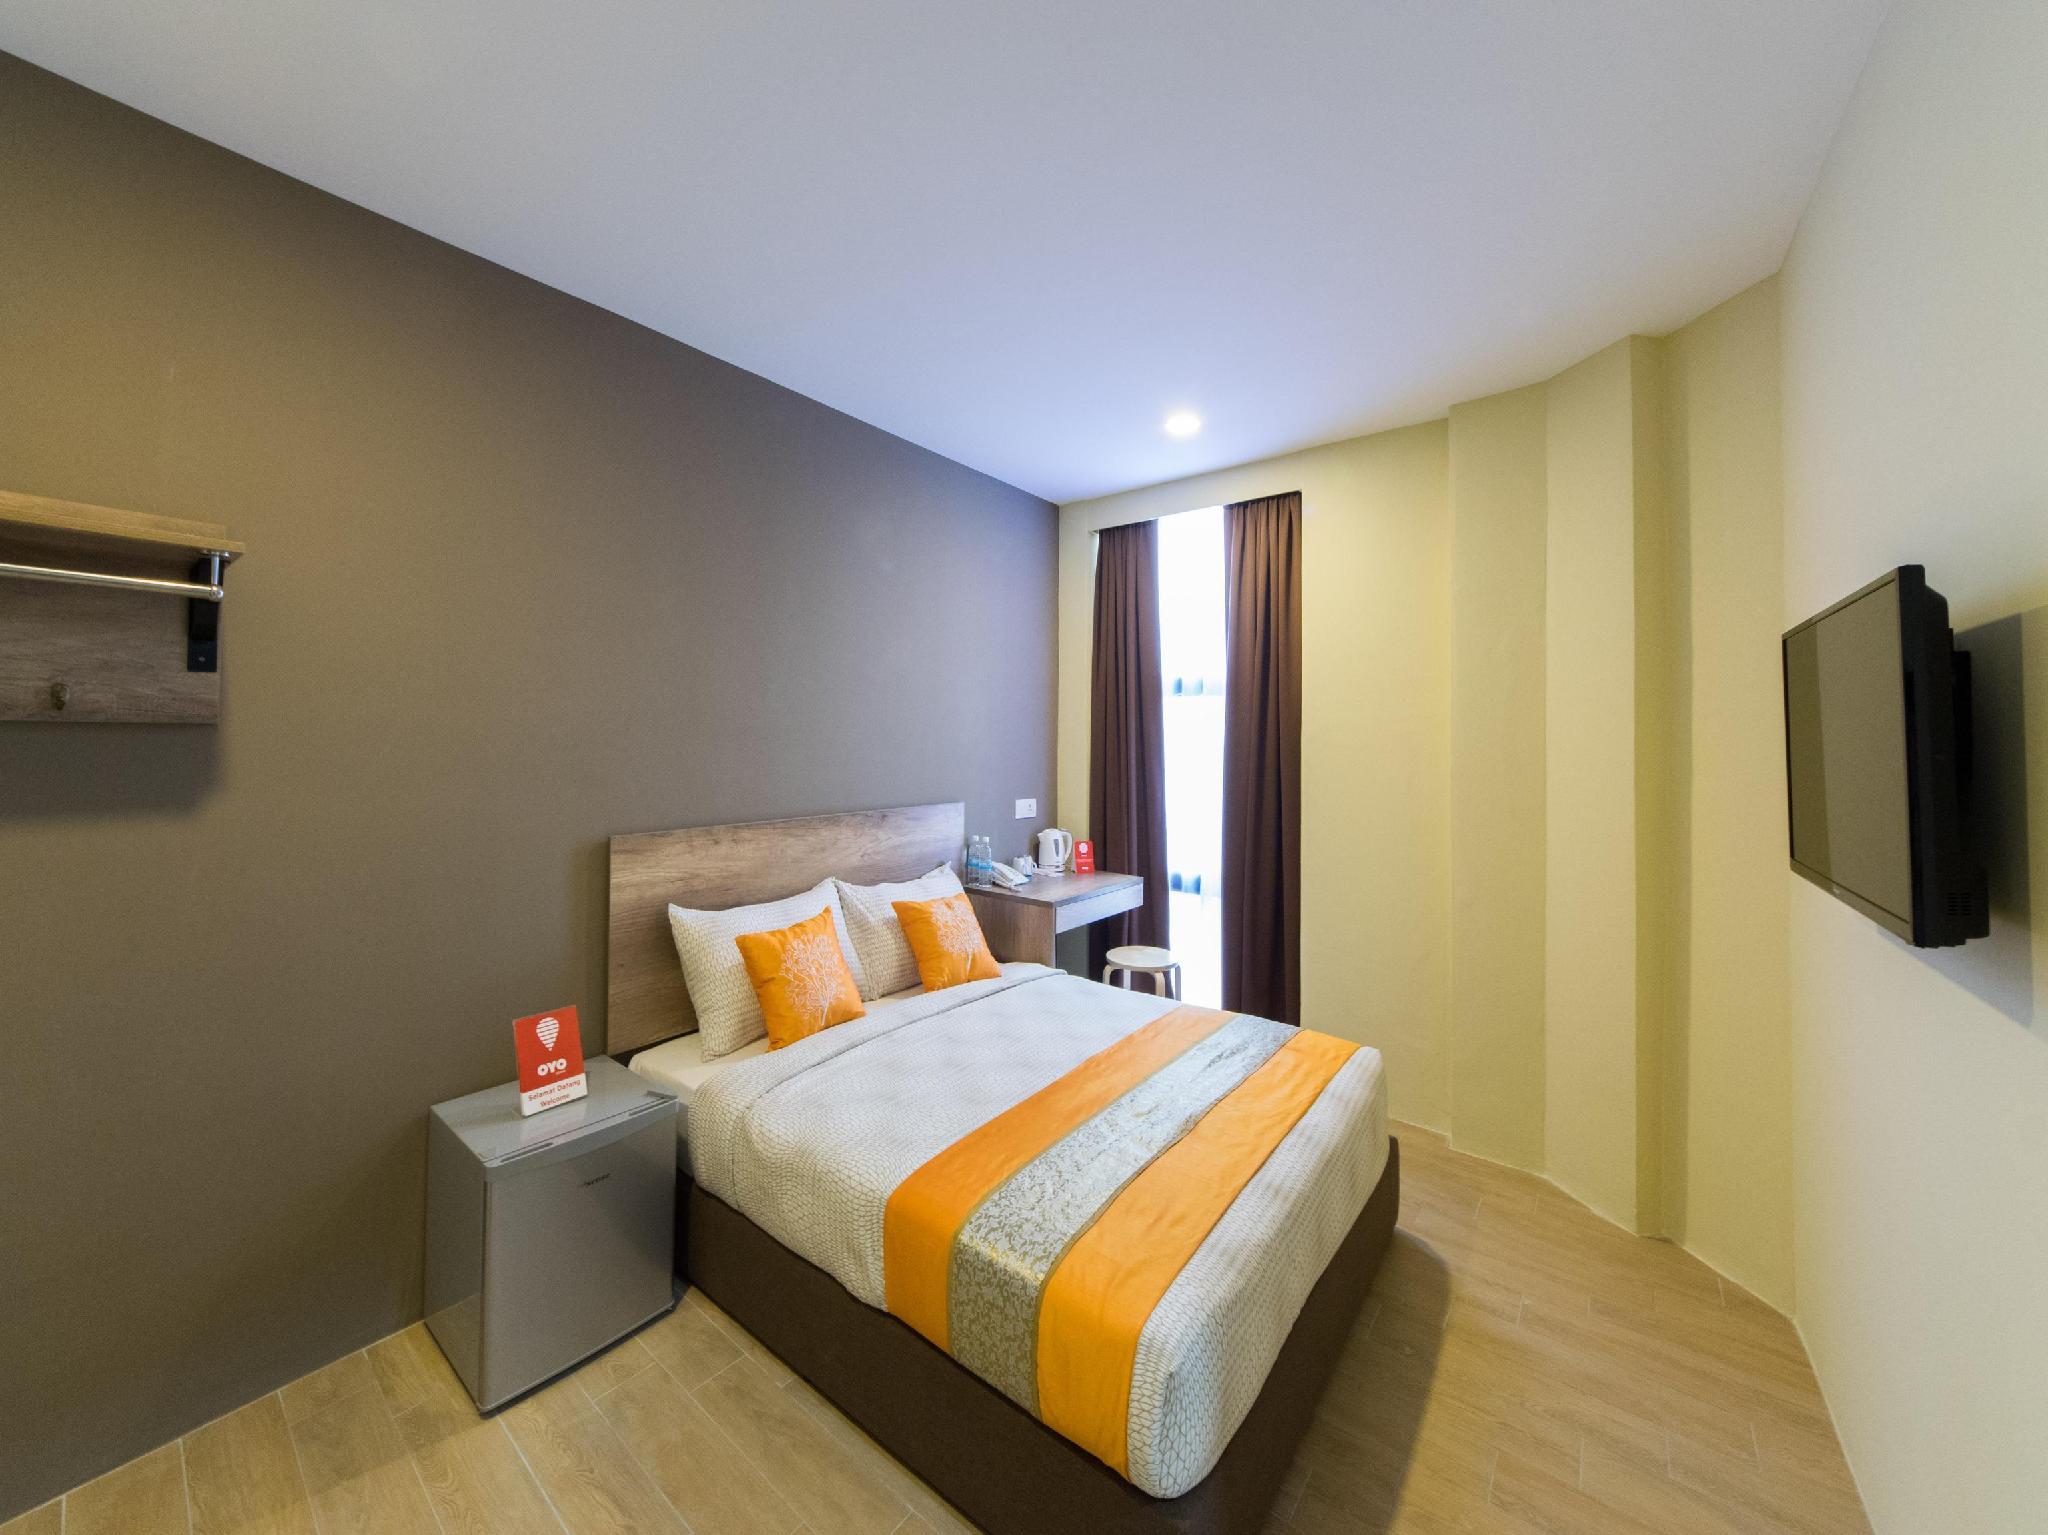 OYO 142 SH Hotel Kota Damansara